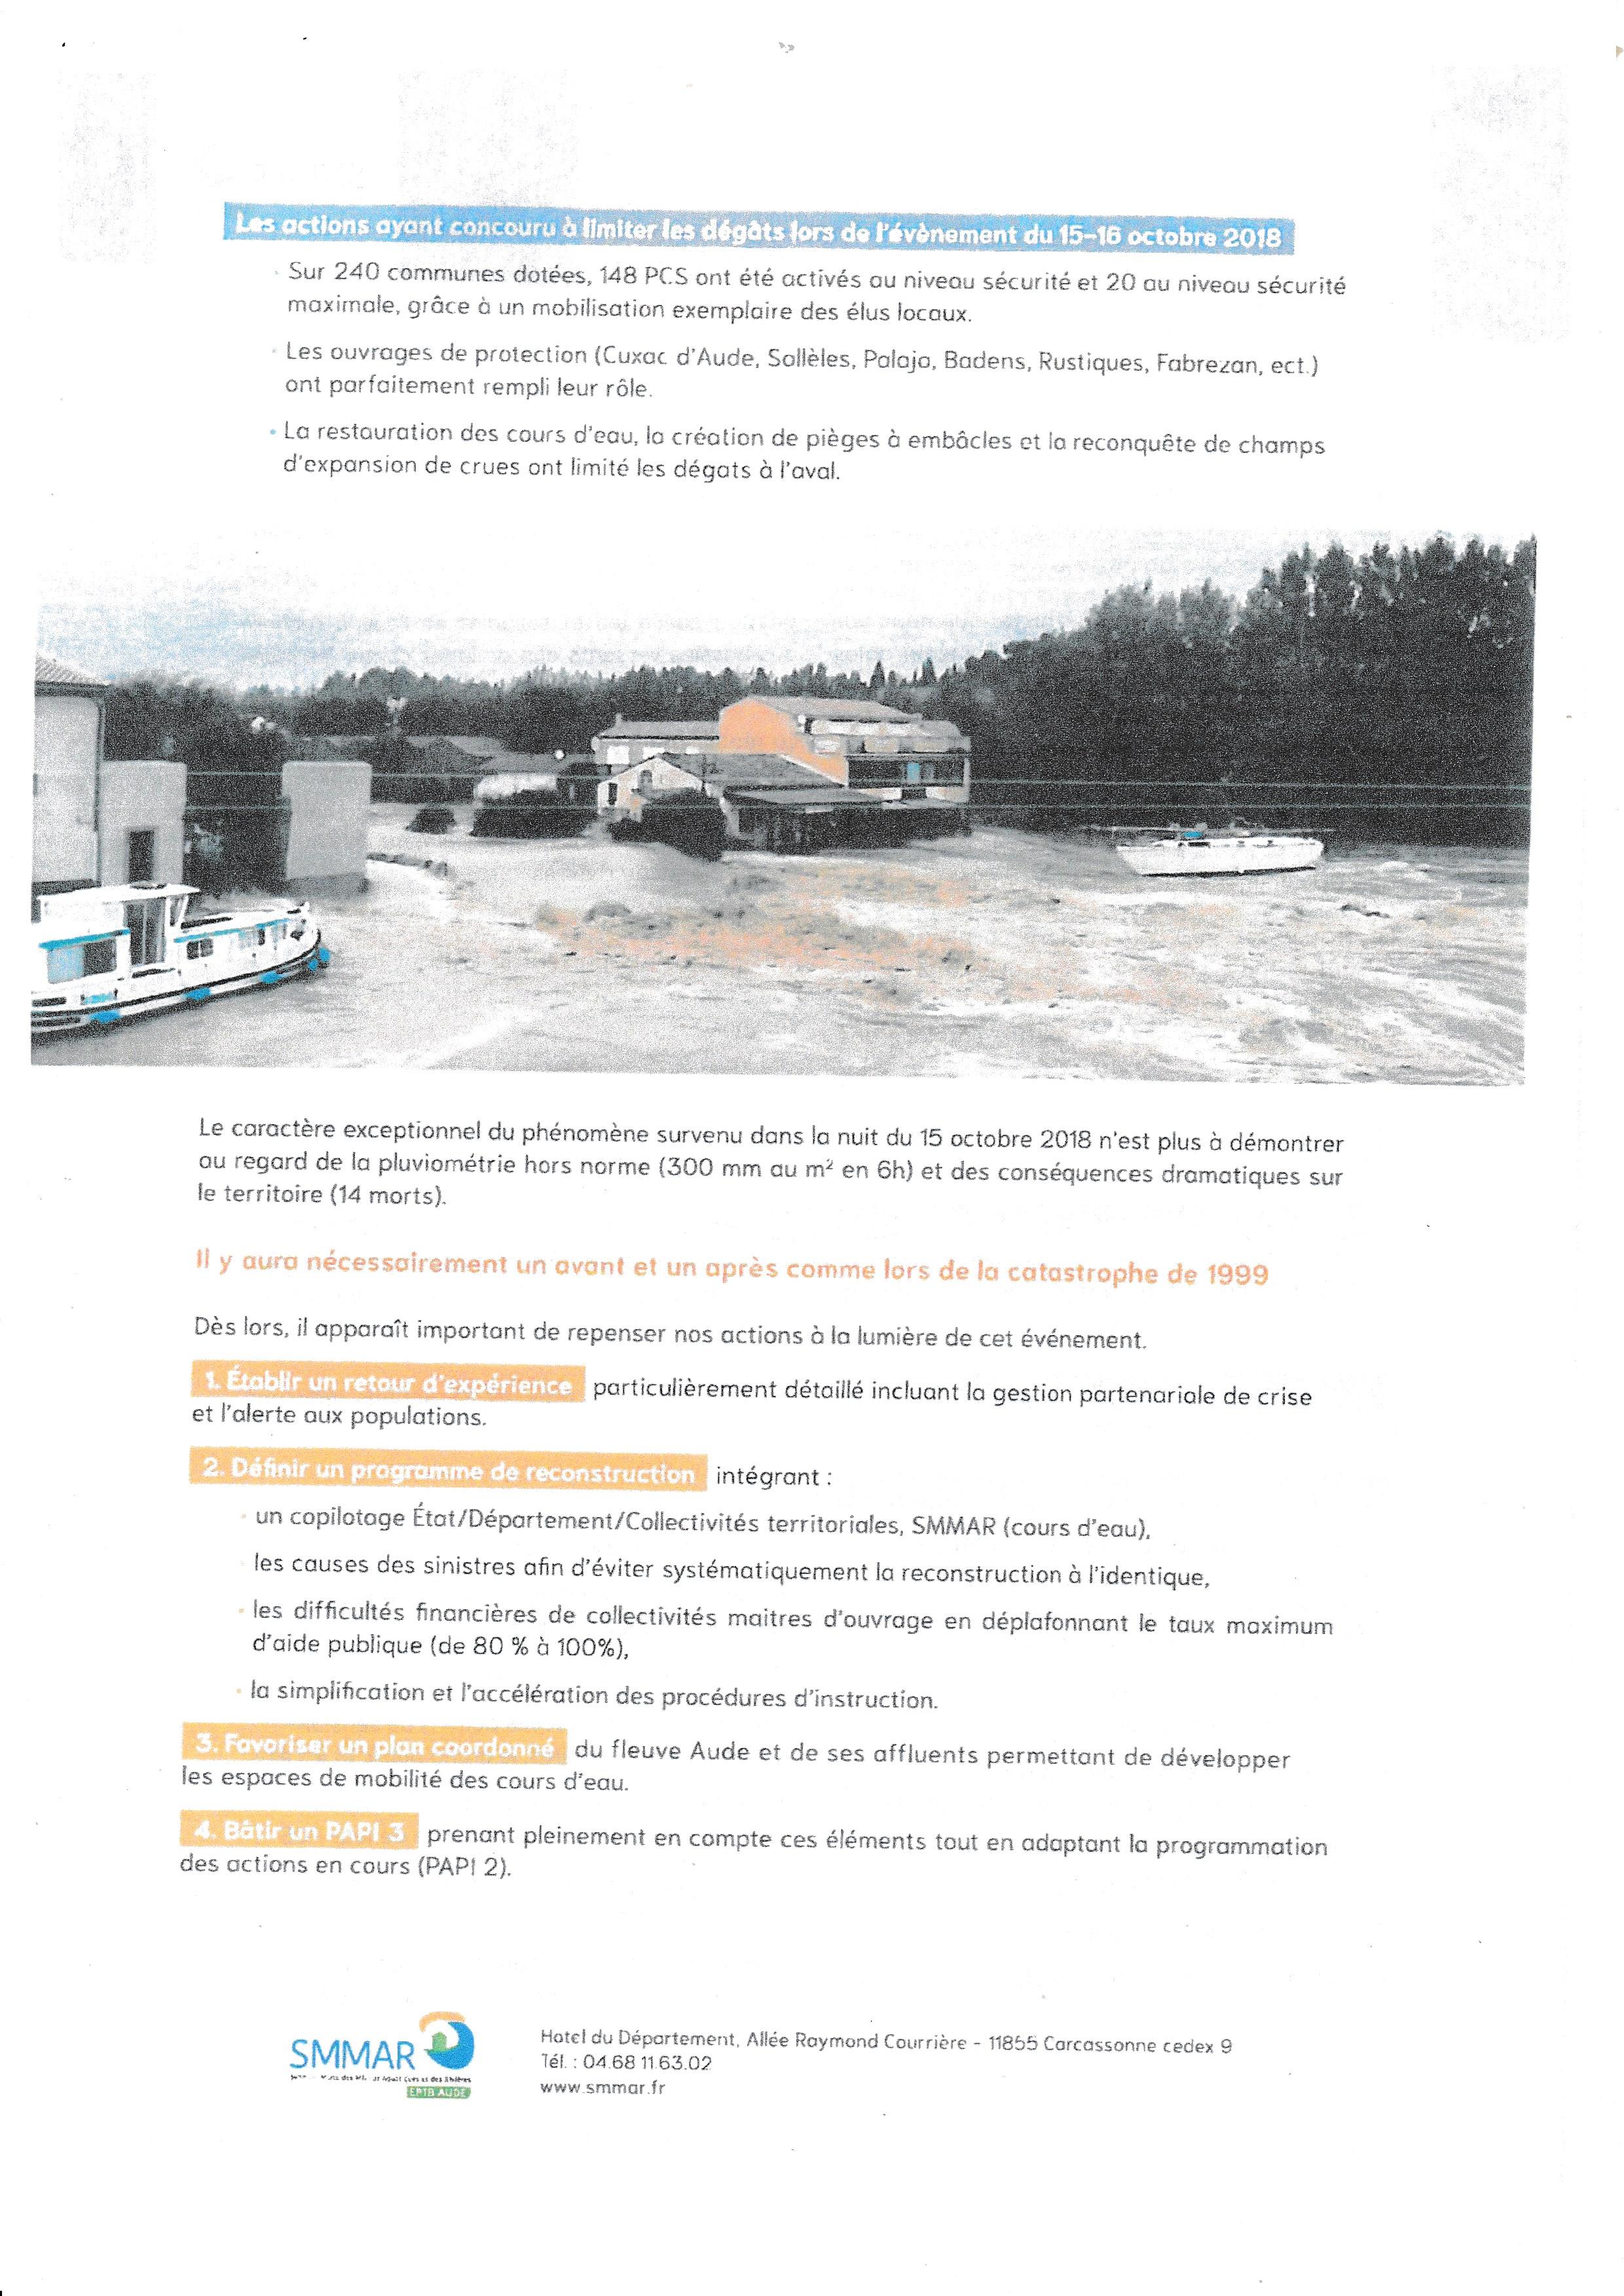 crue de l'Aude et de ses affluents 2